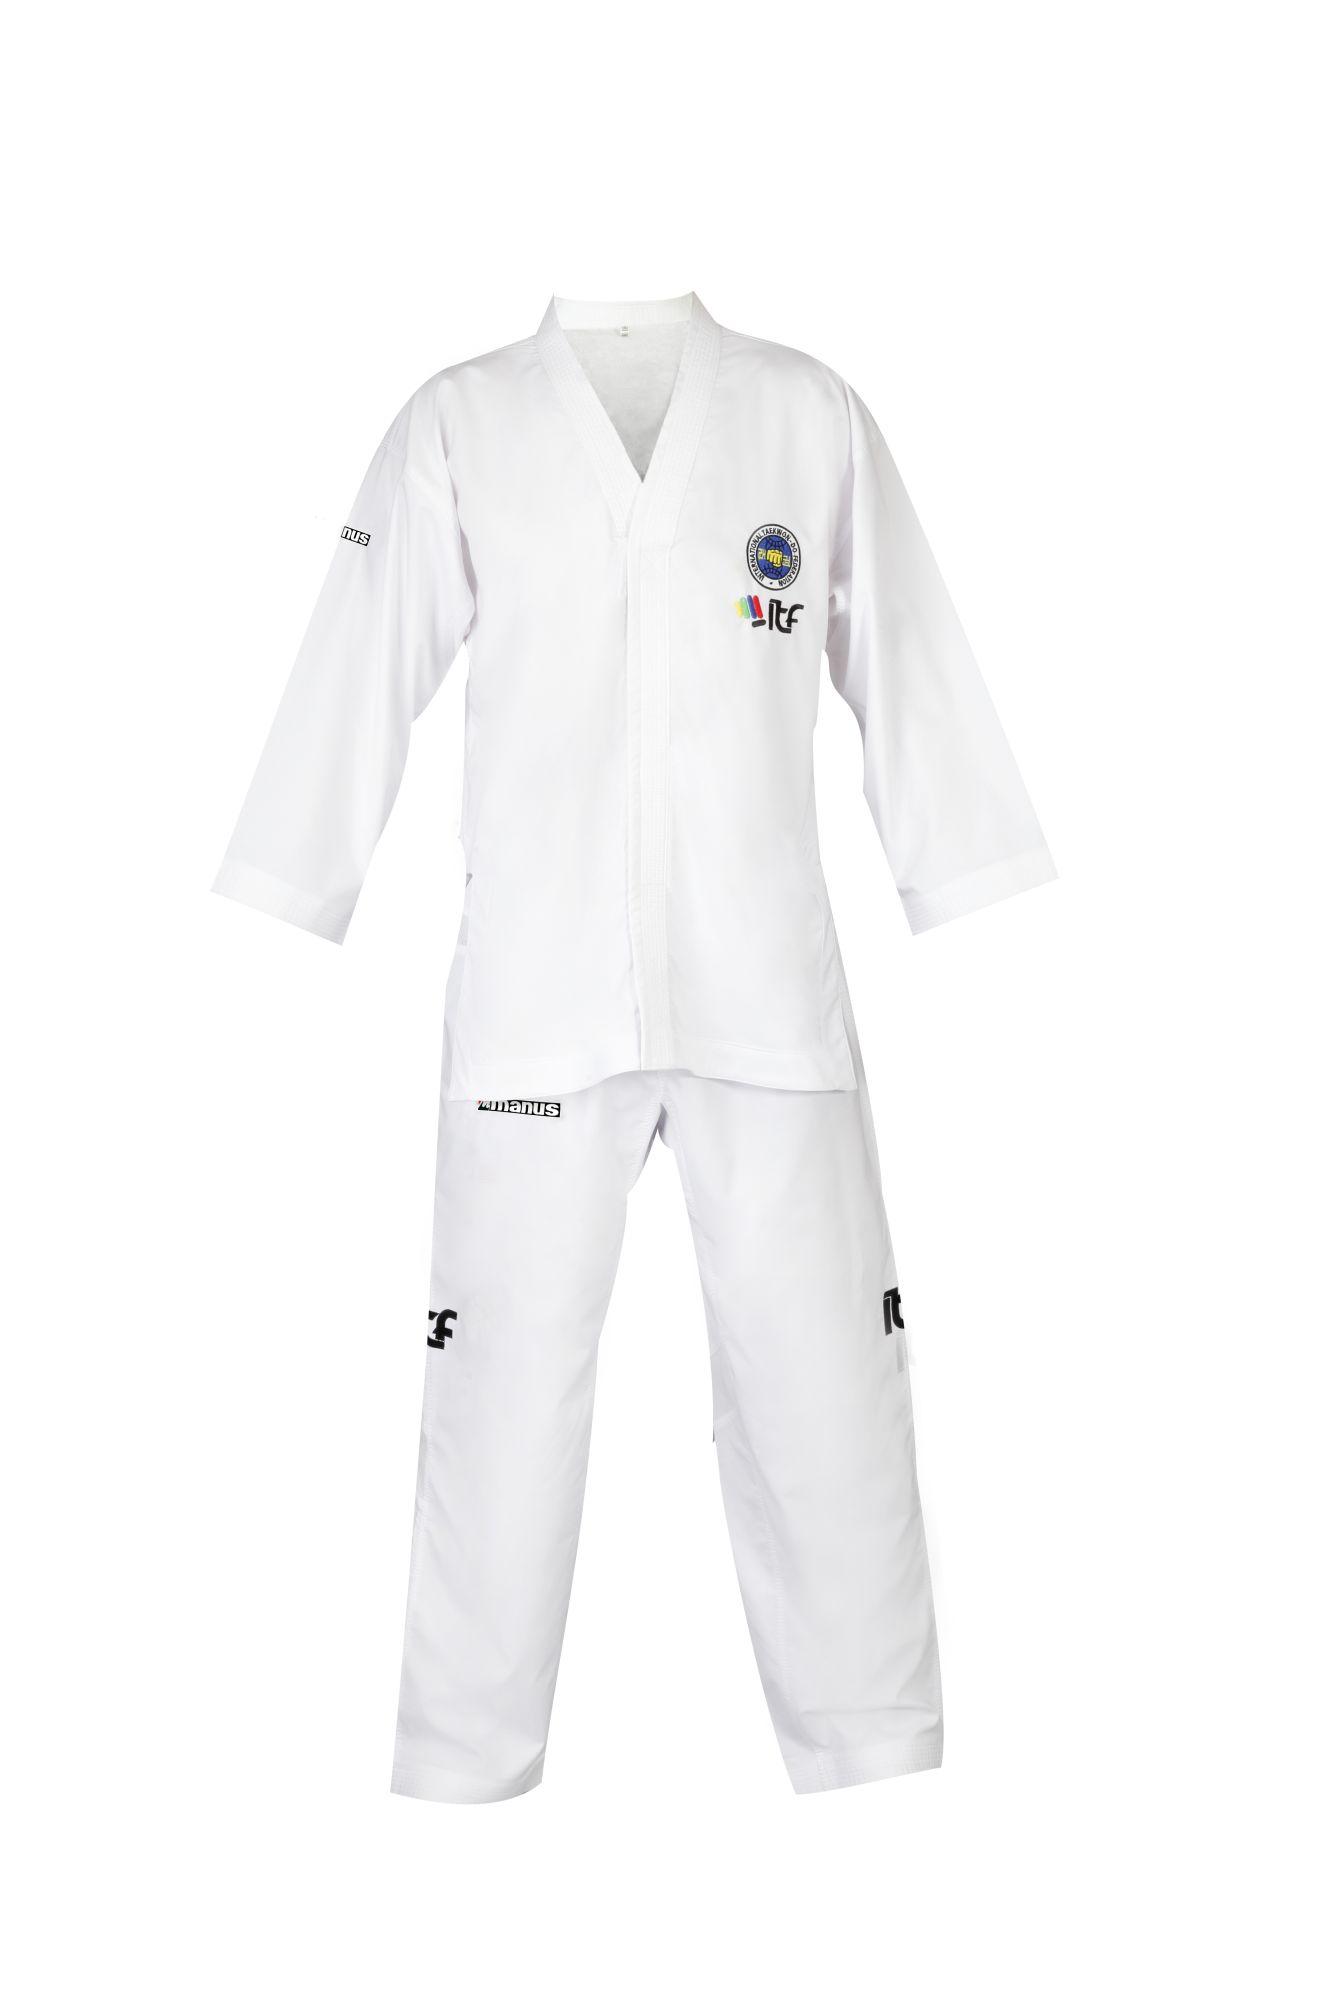 "Manus Taekwondopak ""Student"" (ITF approved) (Wit)"